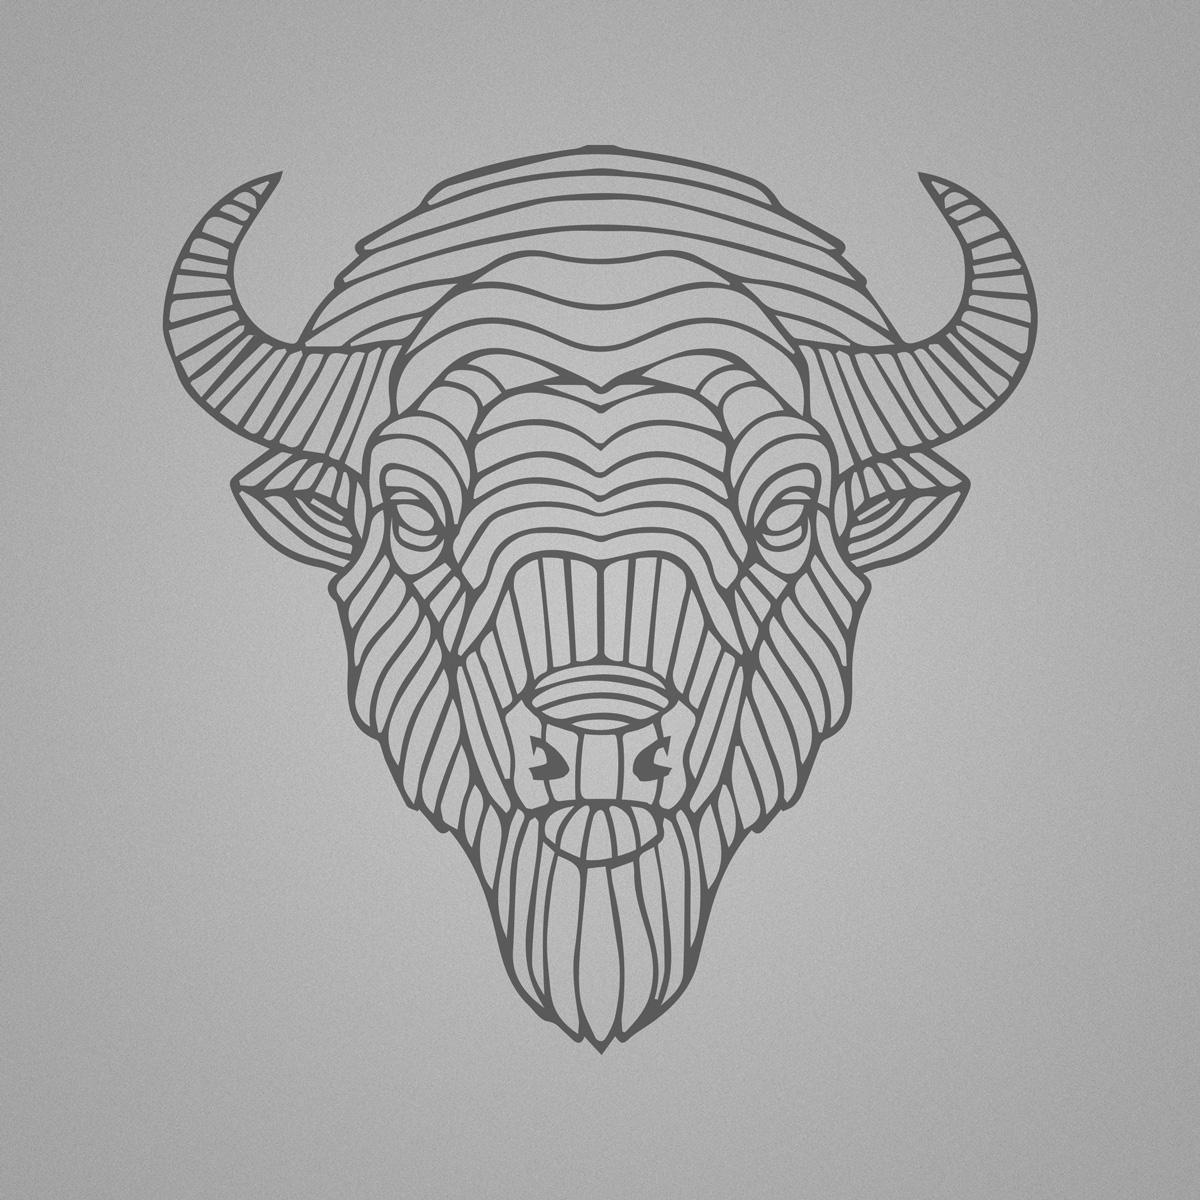 Bison-Bleu-19.jpg